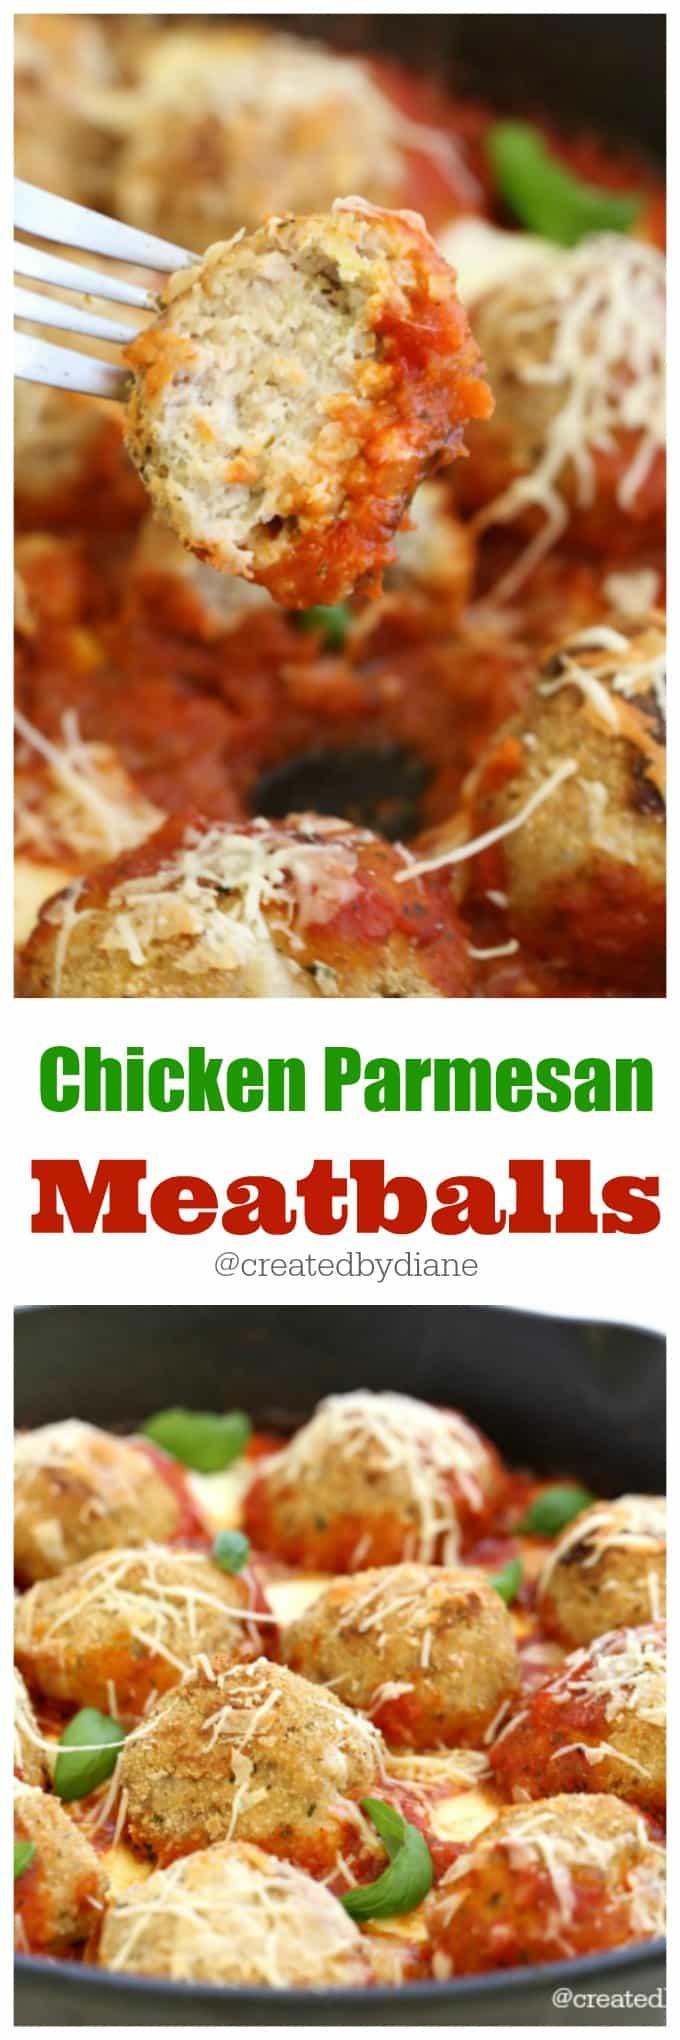 Chicken Parmesan Meatballs cast iron skillet recipe @createdbydiane